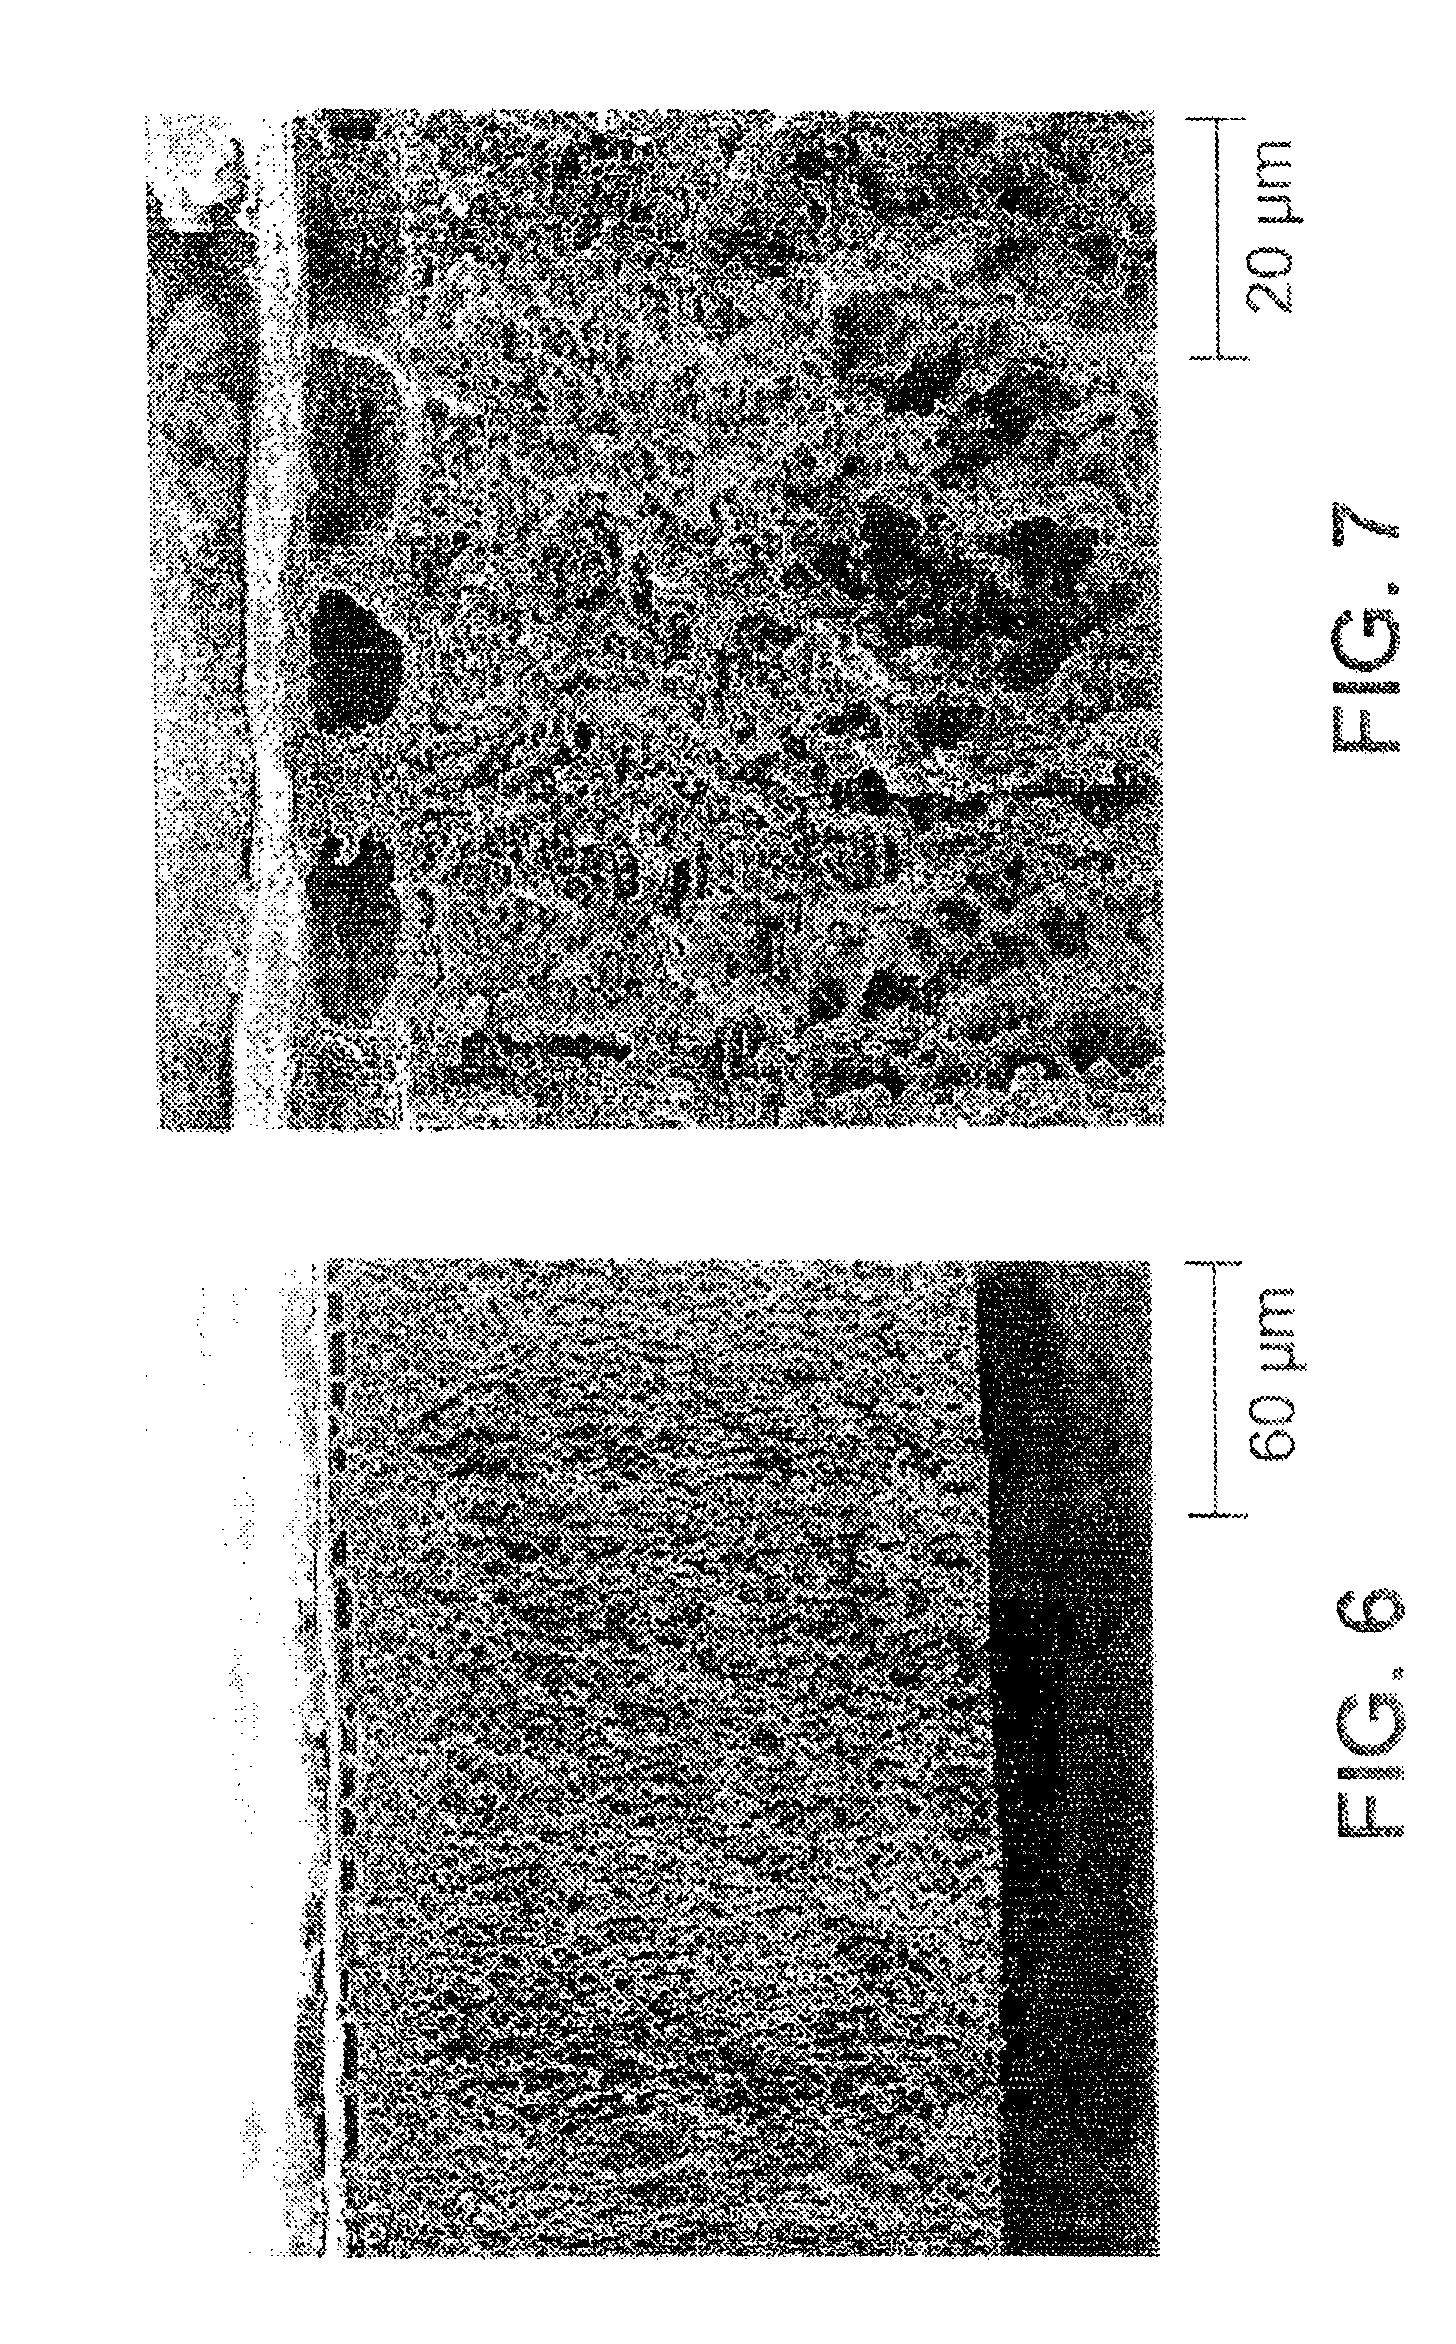 CELLULOSIC ULTRAFILTRATION MEMBRANE - Patent 0772489